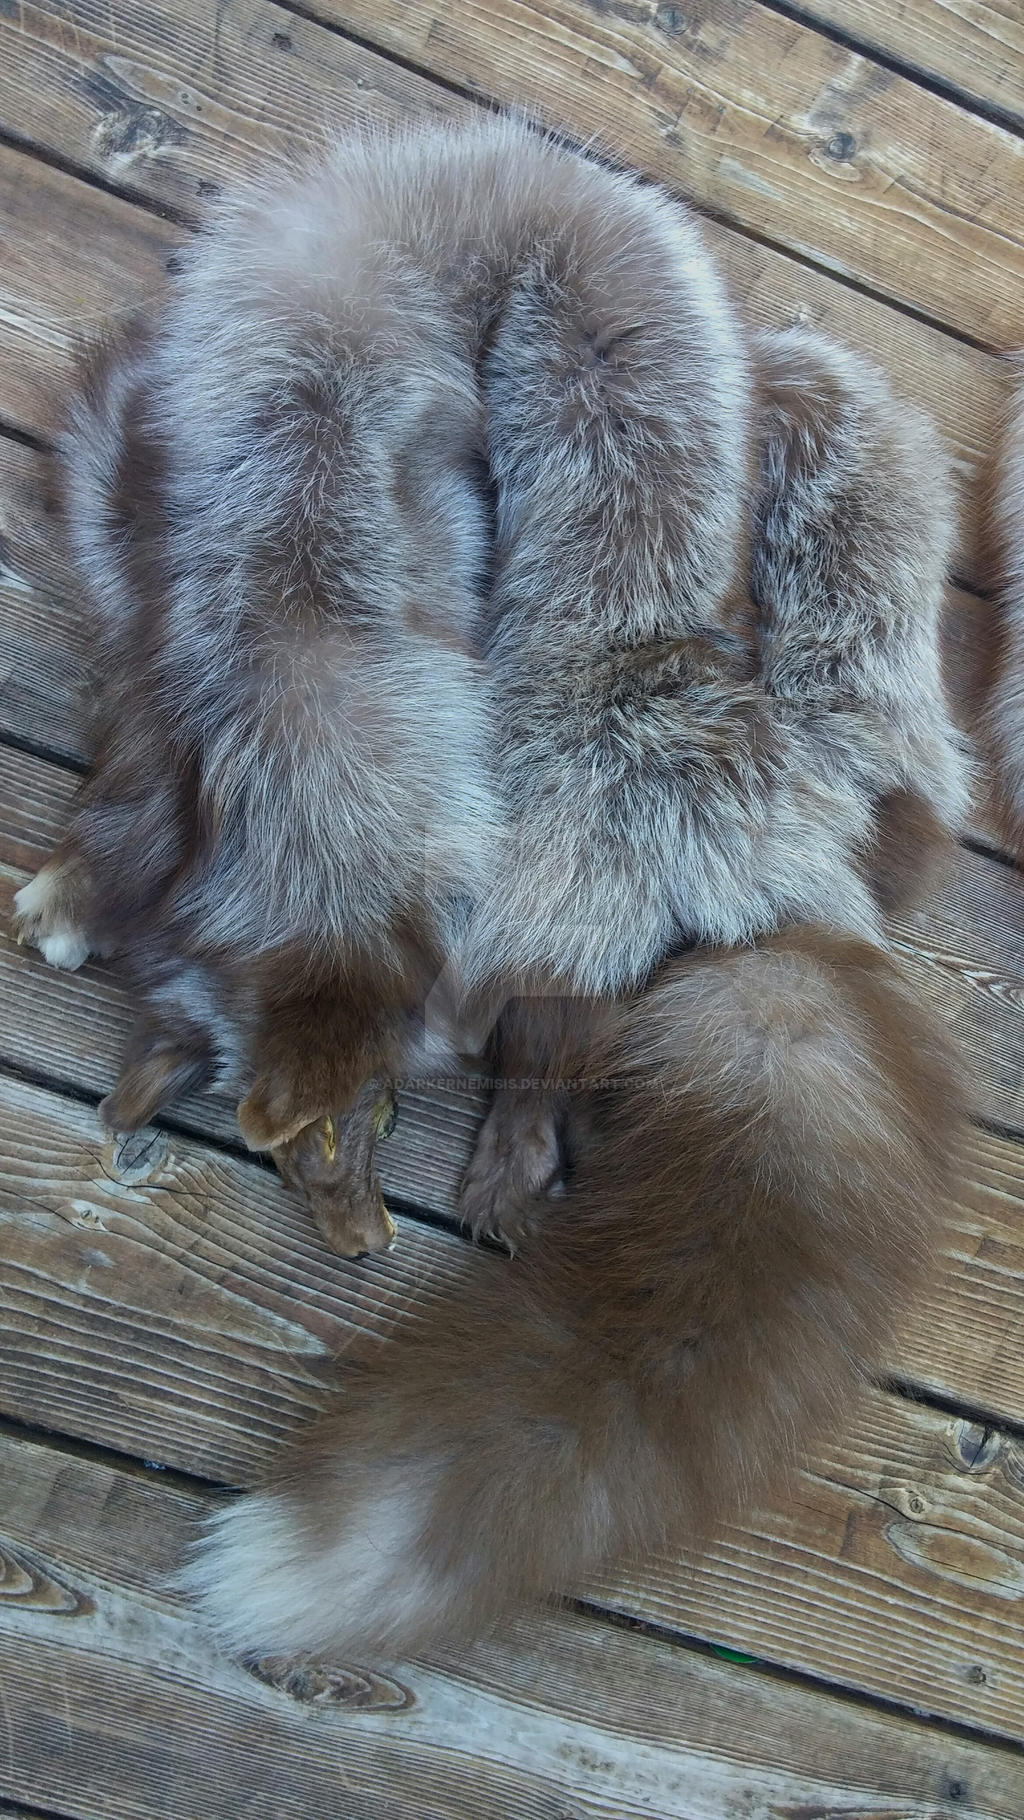 Plolish brown fox Scrap FS by AdarkerNEMISIS